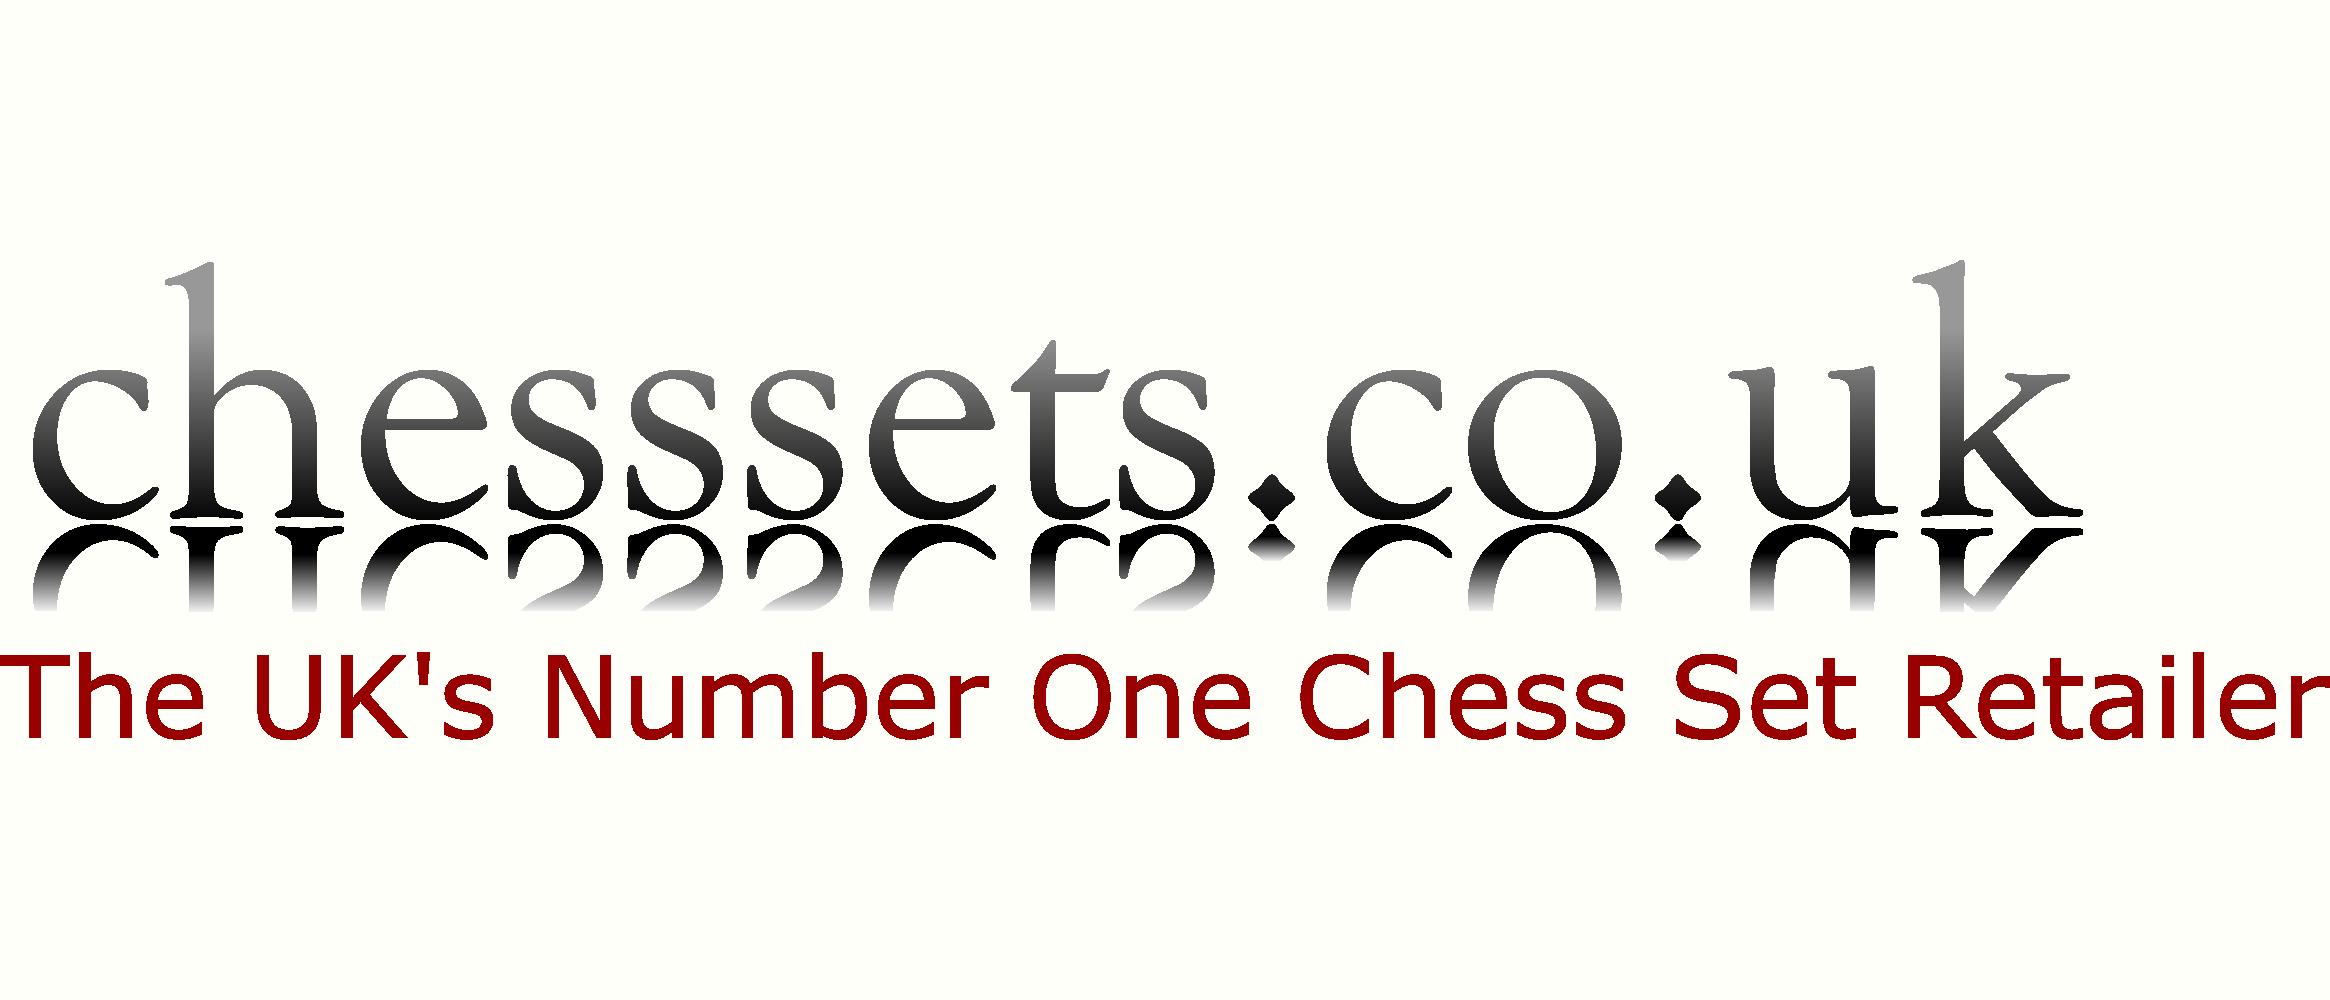 Tower Hand Carved Sheesham and Boxwood Chess Pieces at ChessSets.co.uk at ChessSets.co.uk